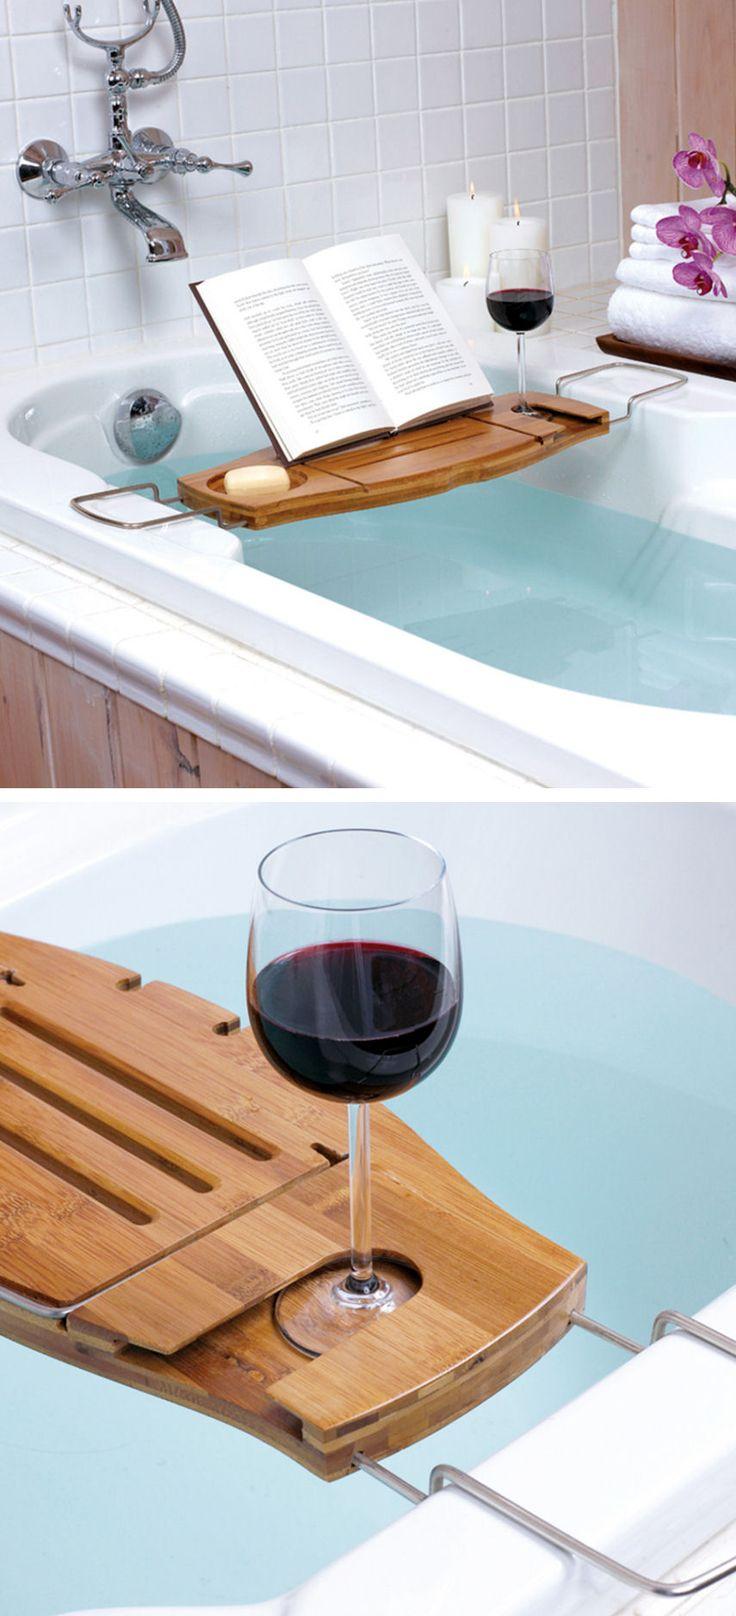 Bath Caddy with Wine Glass Holder // L.O.V.E.